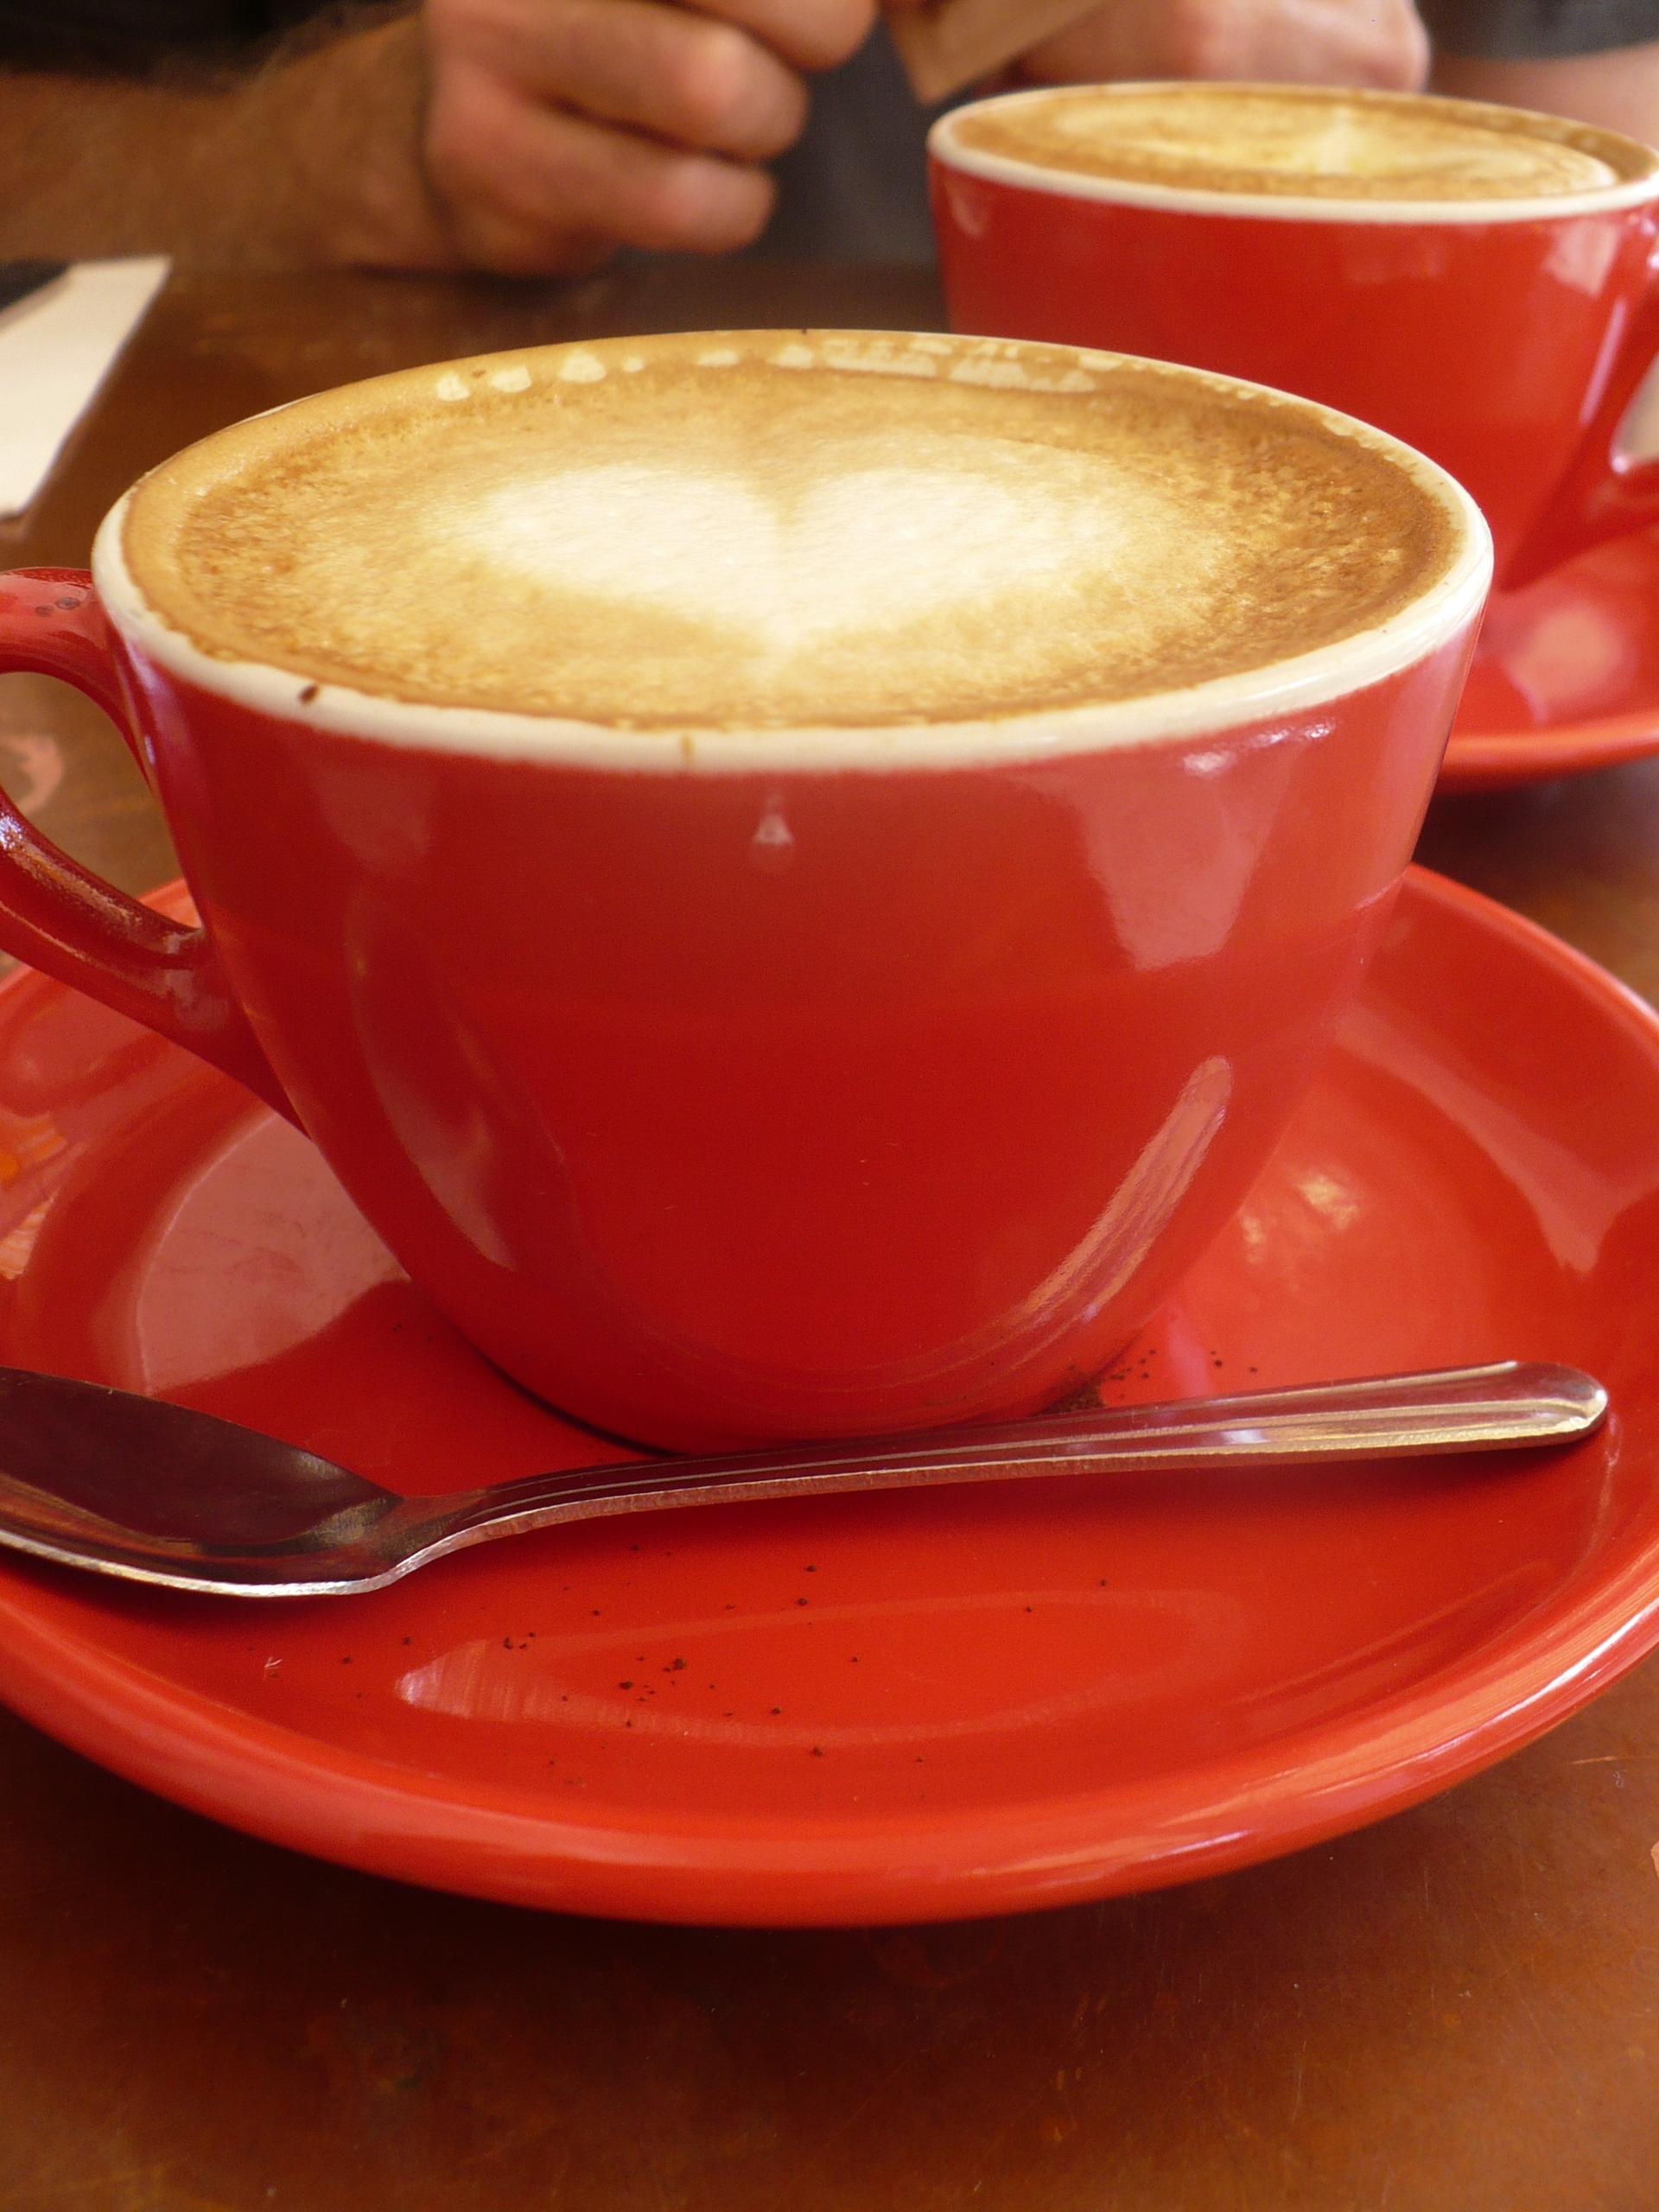 Cafe Creme + Strawberry Jam = Breakfast